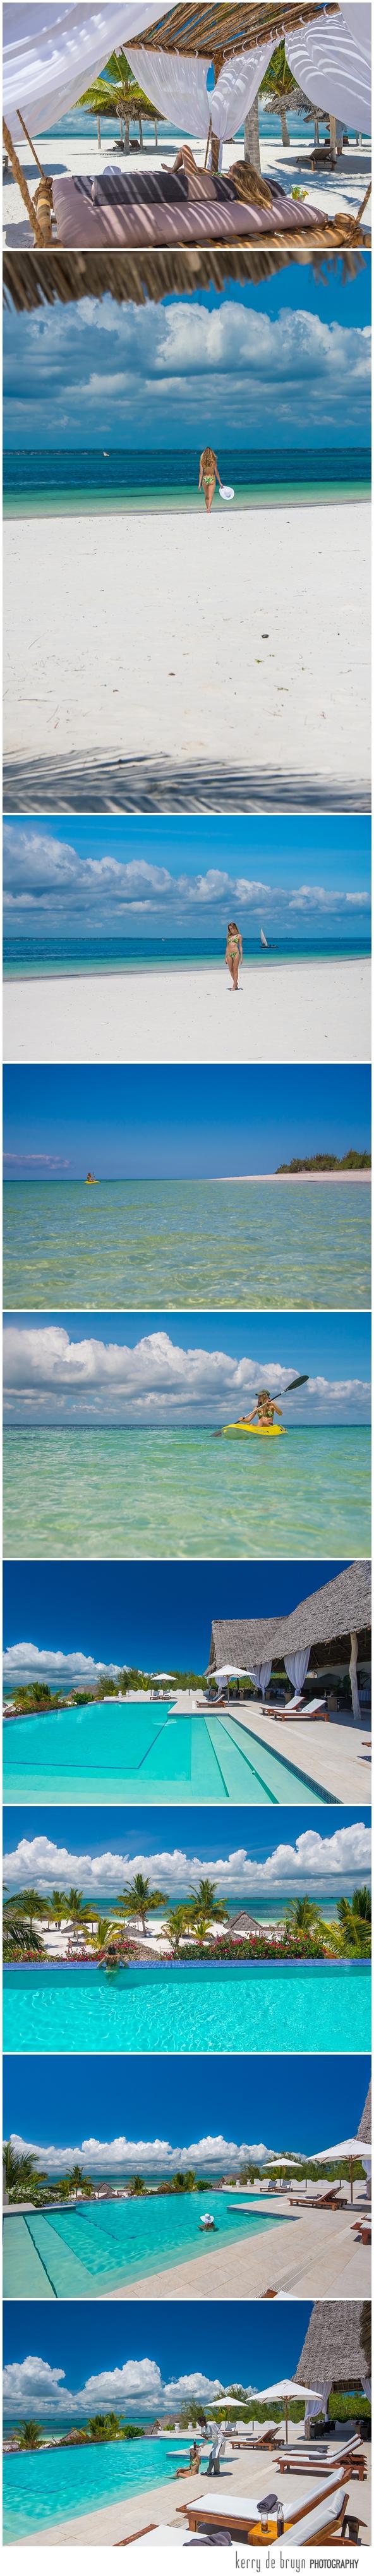 Island resort photography